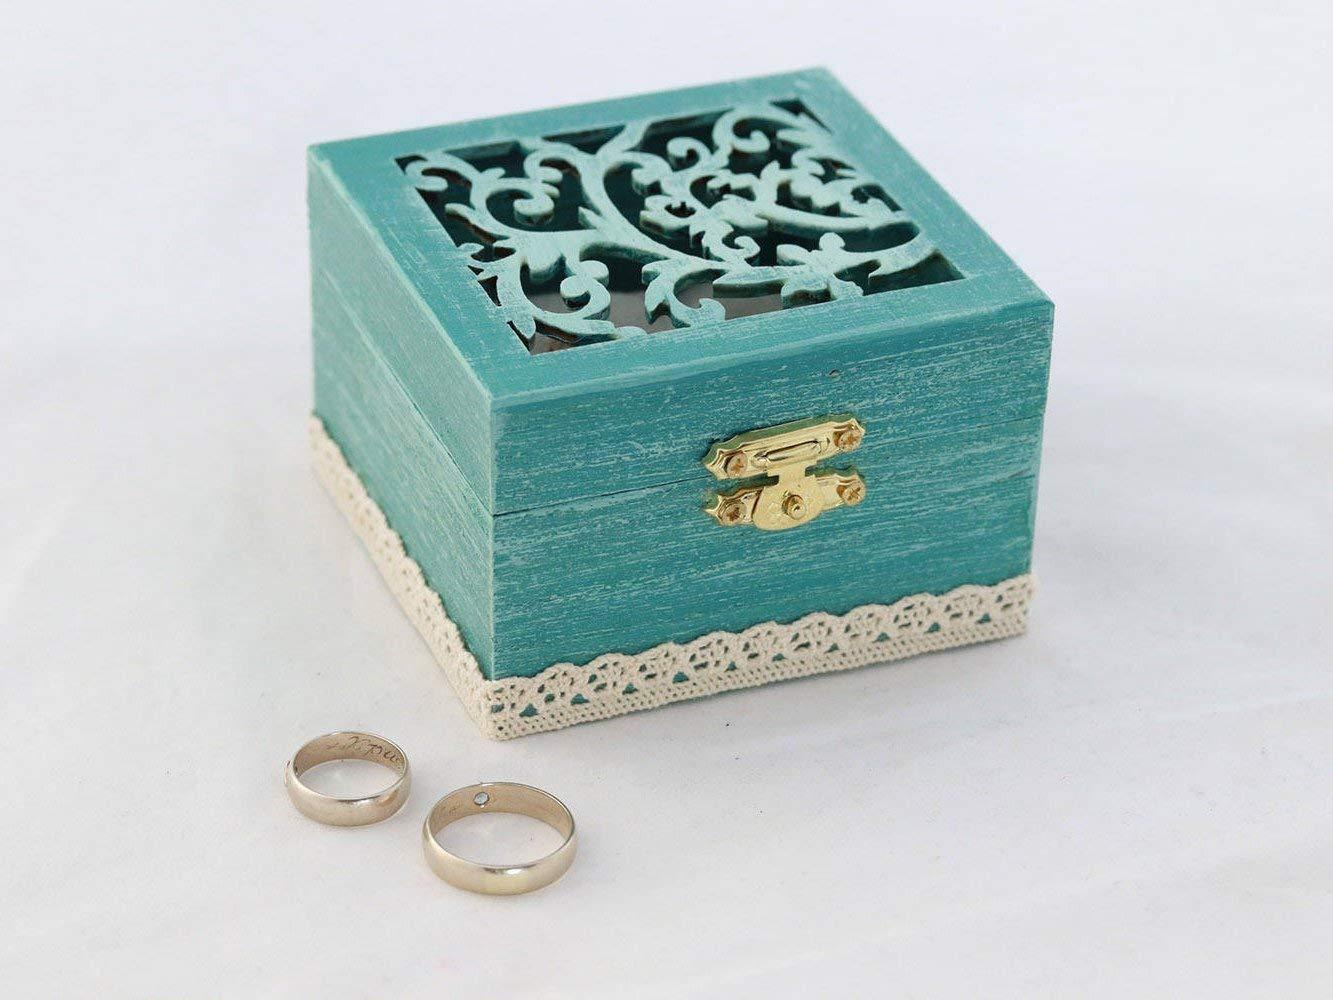 Autumn Wedding ring box Personalized ring box Custom Ring bearer box Fall Wreath box Woodland wedding Nature wedding Engagement ring box